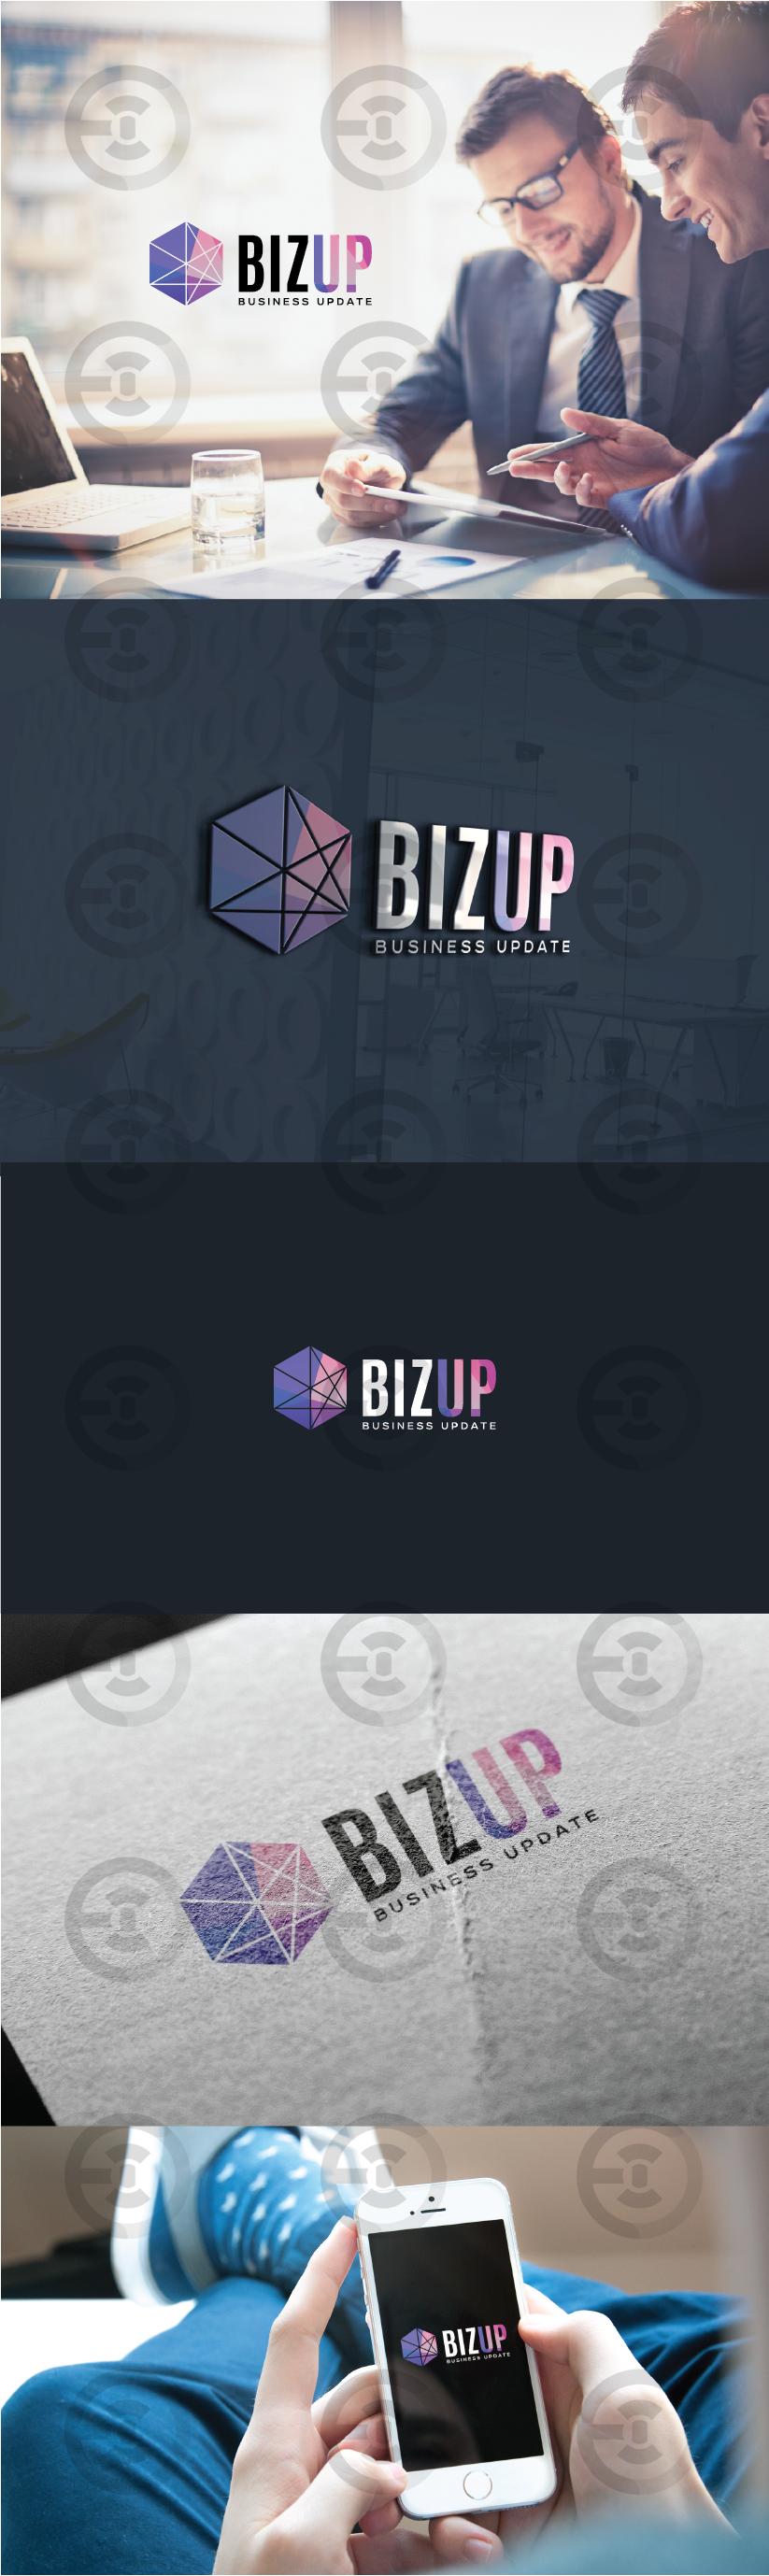 BizUP_11_лого-01.png